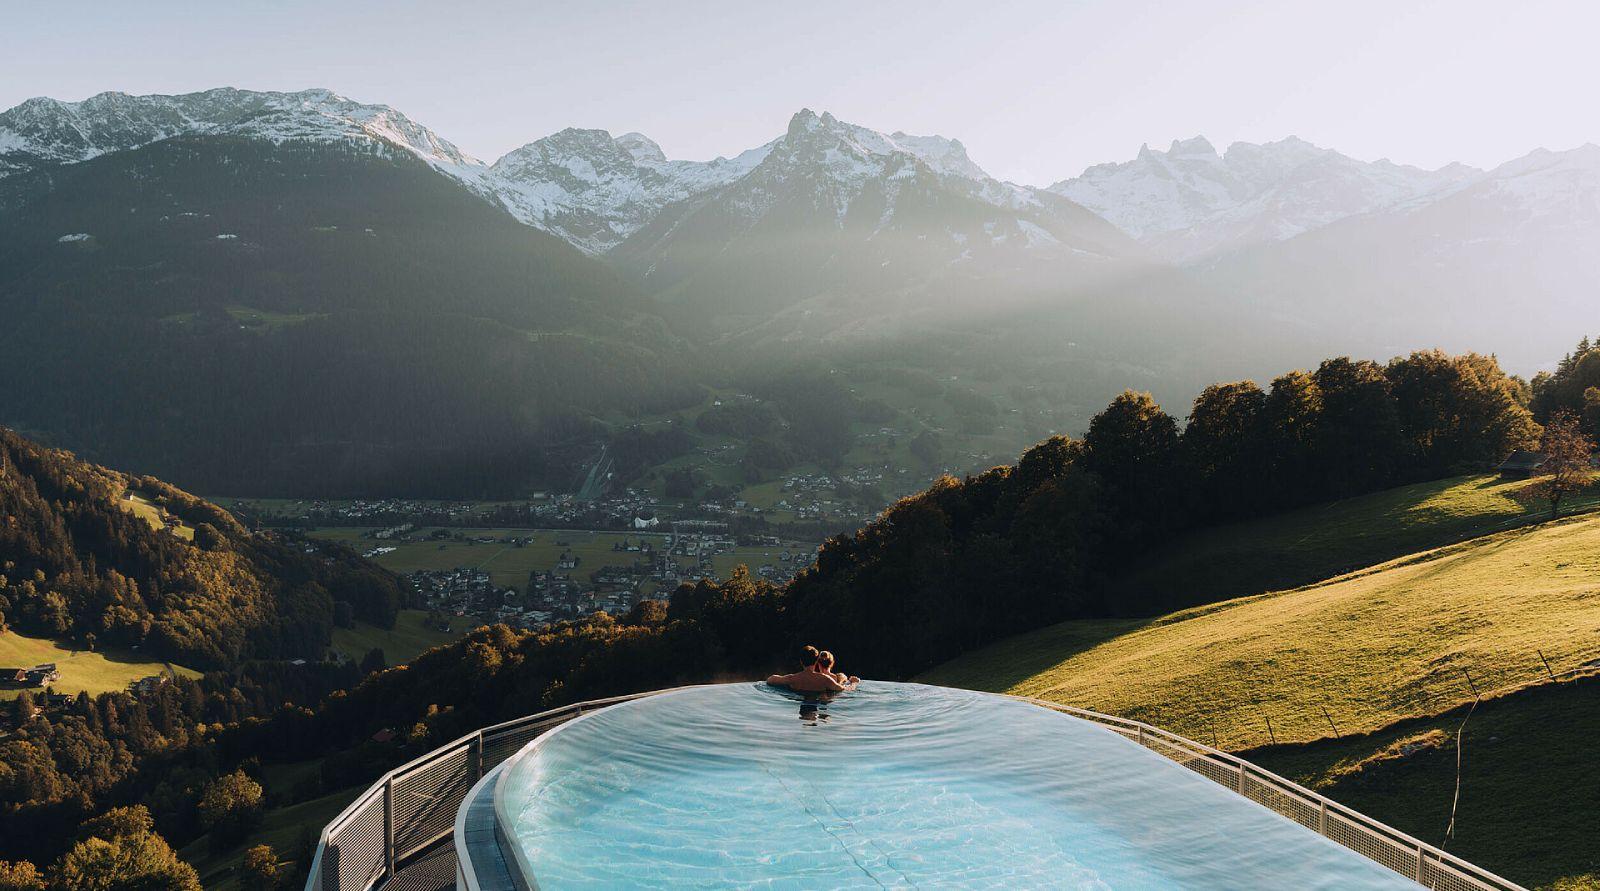 outdoor-pool montafon schruns